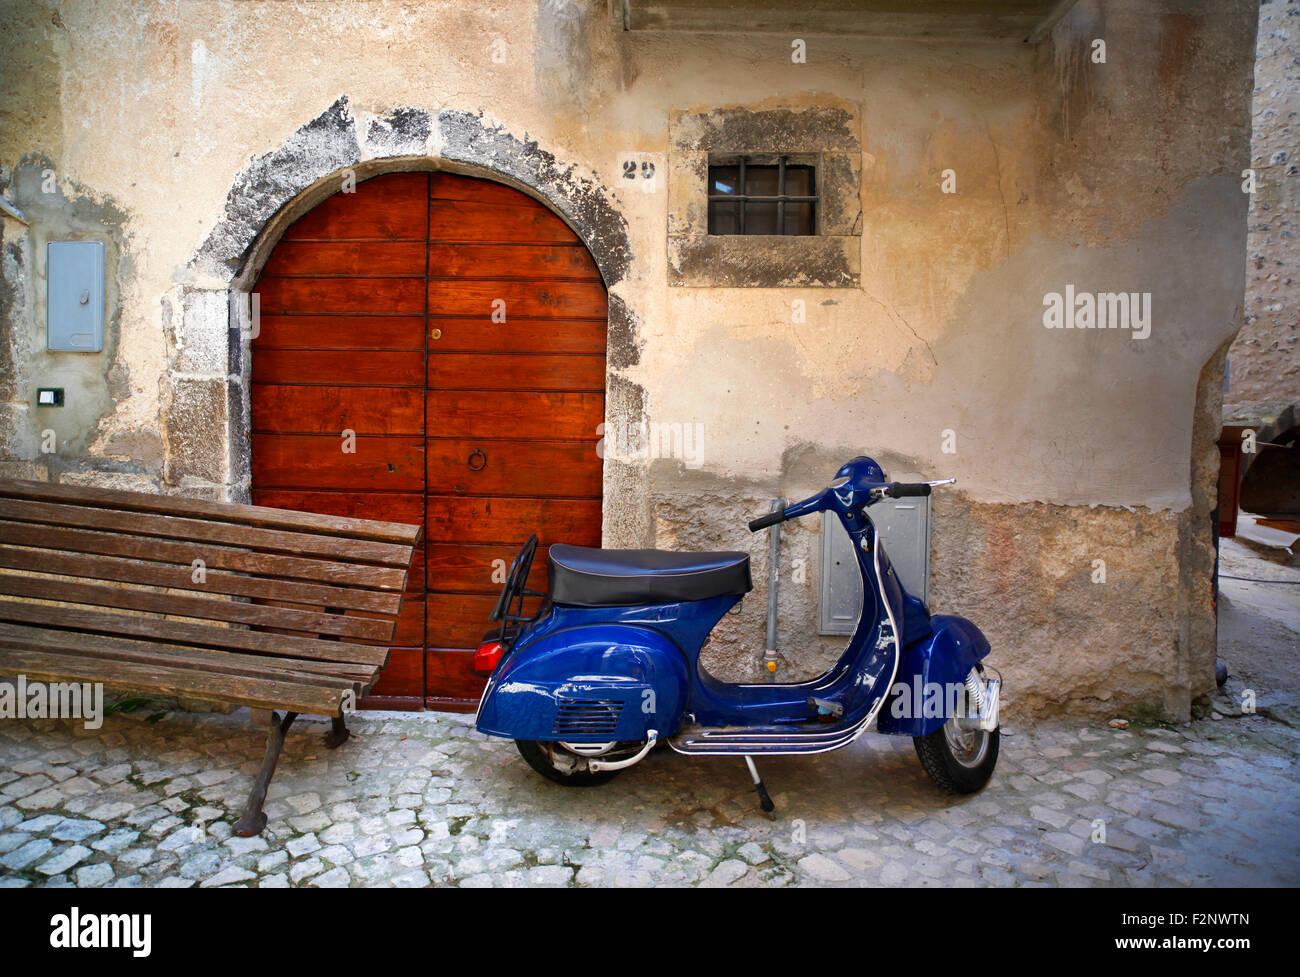 Vespa scooter, Fontecchio, Italy. - Stock Image